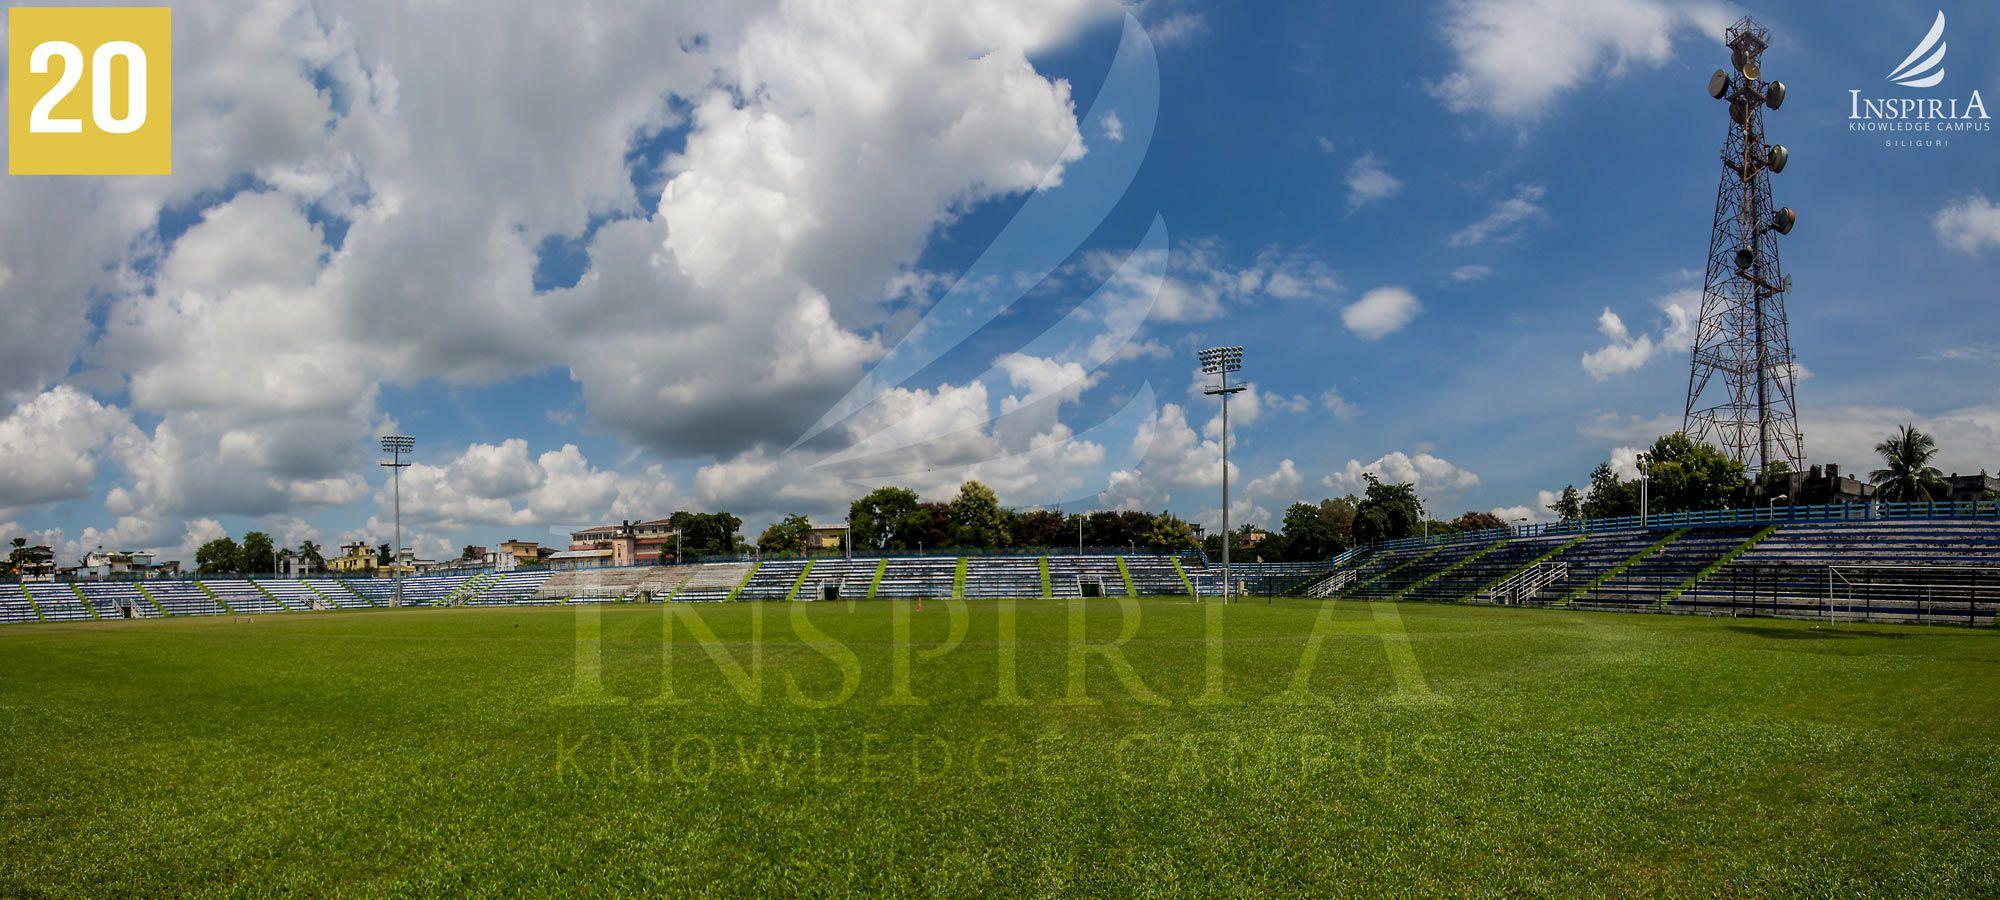 Pano-view-Kanchanjanga-Stadium-Siliguri-wb